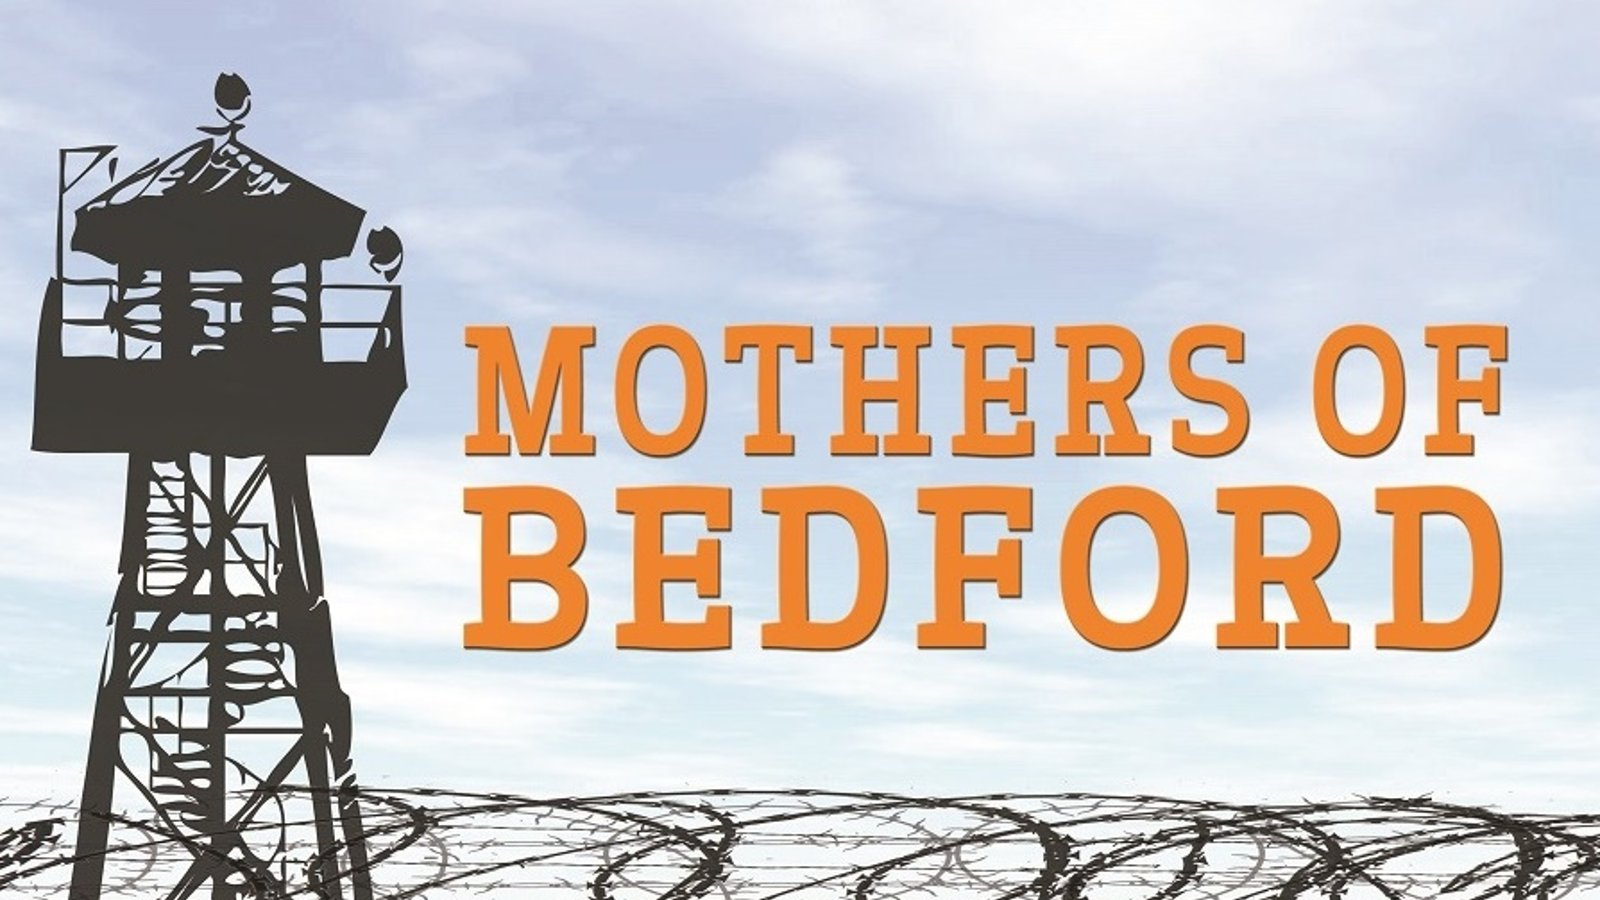 Mothers of Bedford - Women in Prison